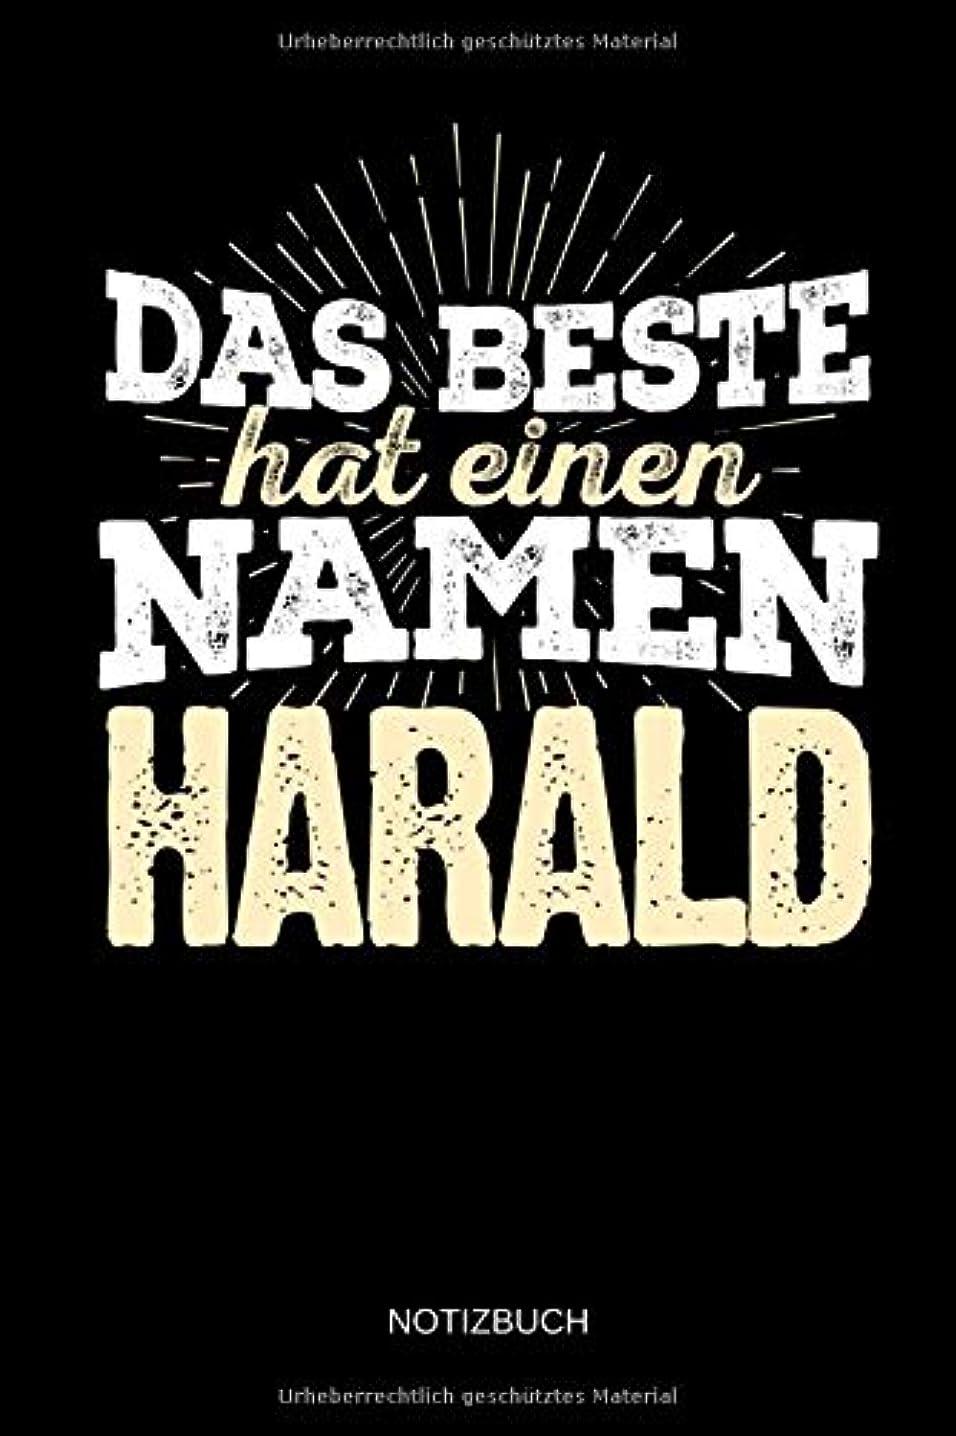 行為鋸歯状枕Das Beste hat einen Namen - Harald: Harald - Lustiges Maenner Namen Notizbuch (liniert). Tolle Vatertag, Namenstag, Weihnachts & Geburtstags Geschenk Idee.